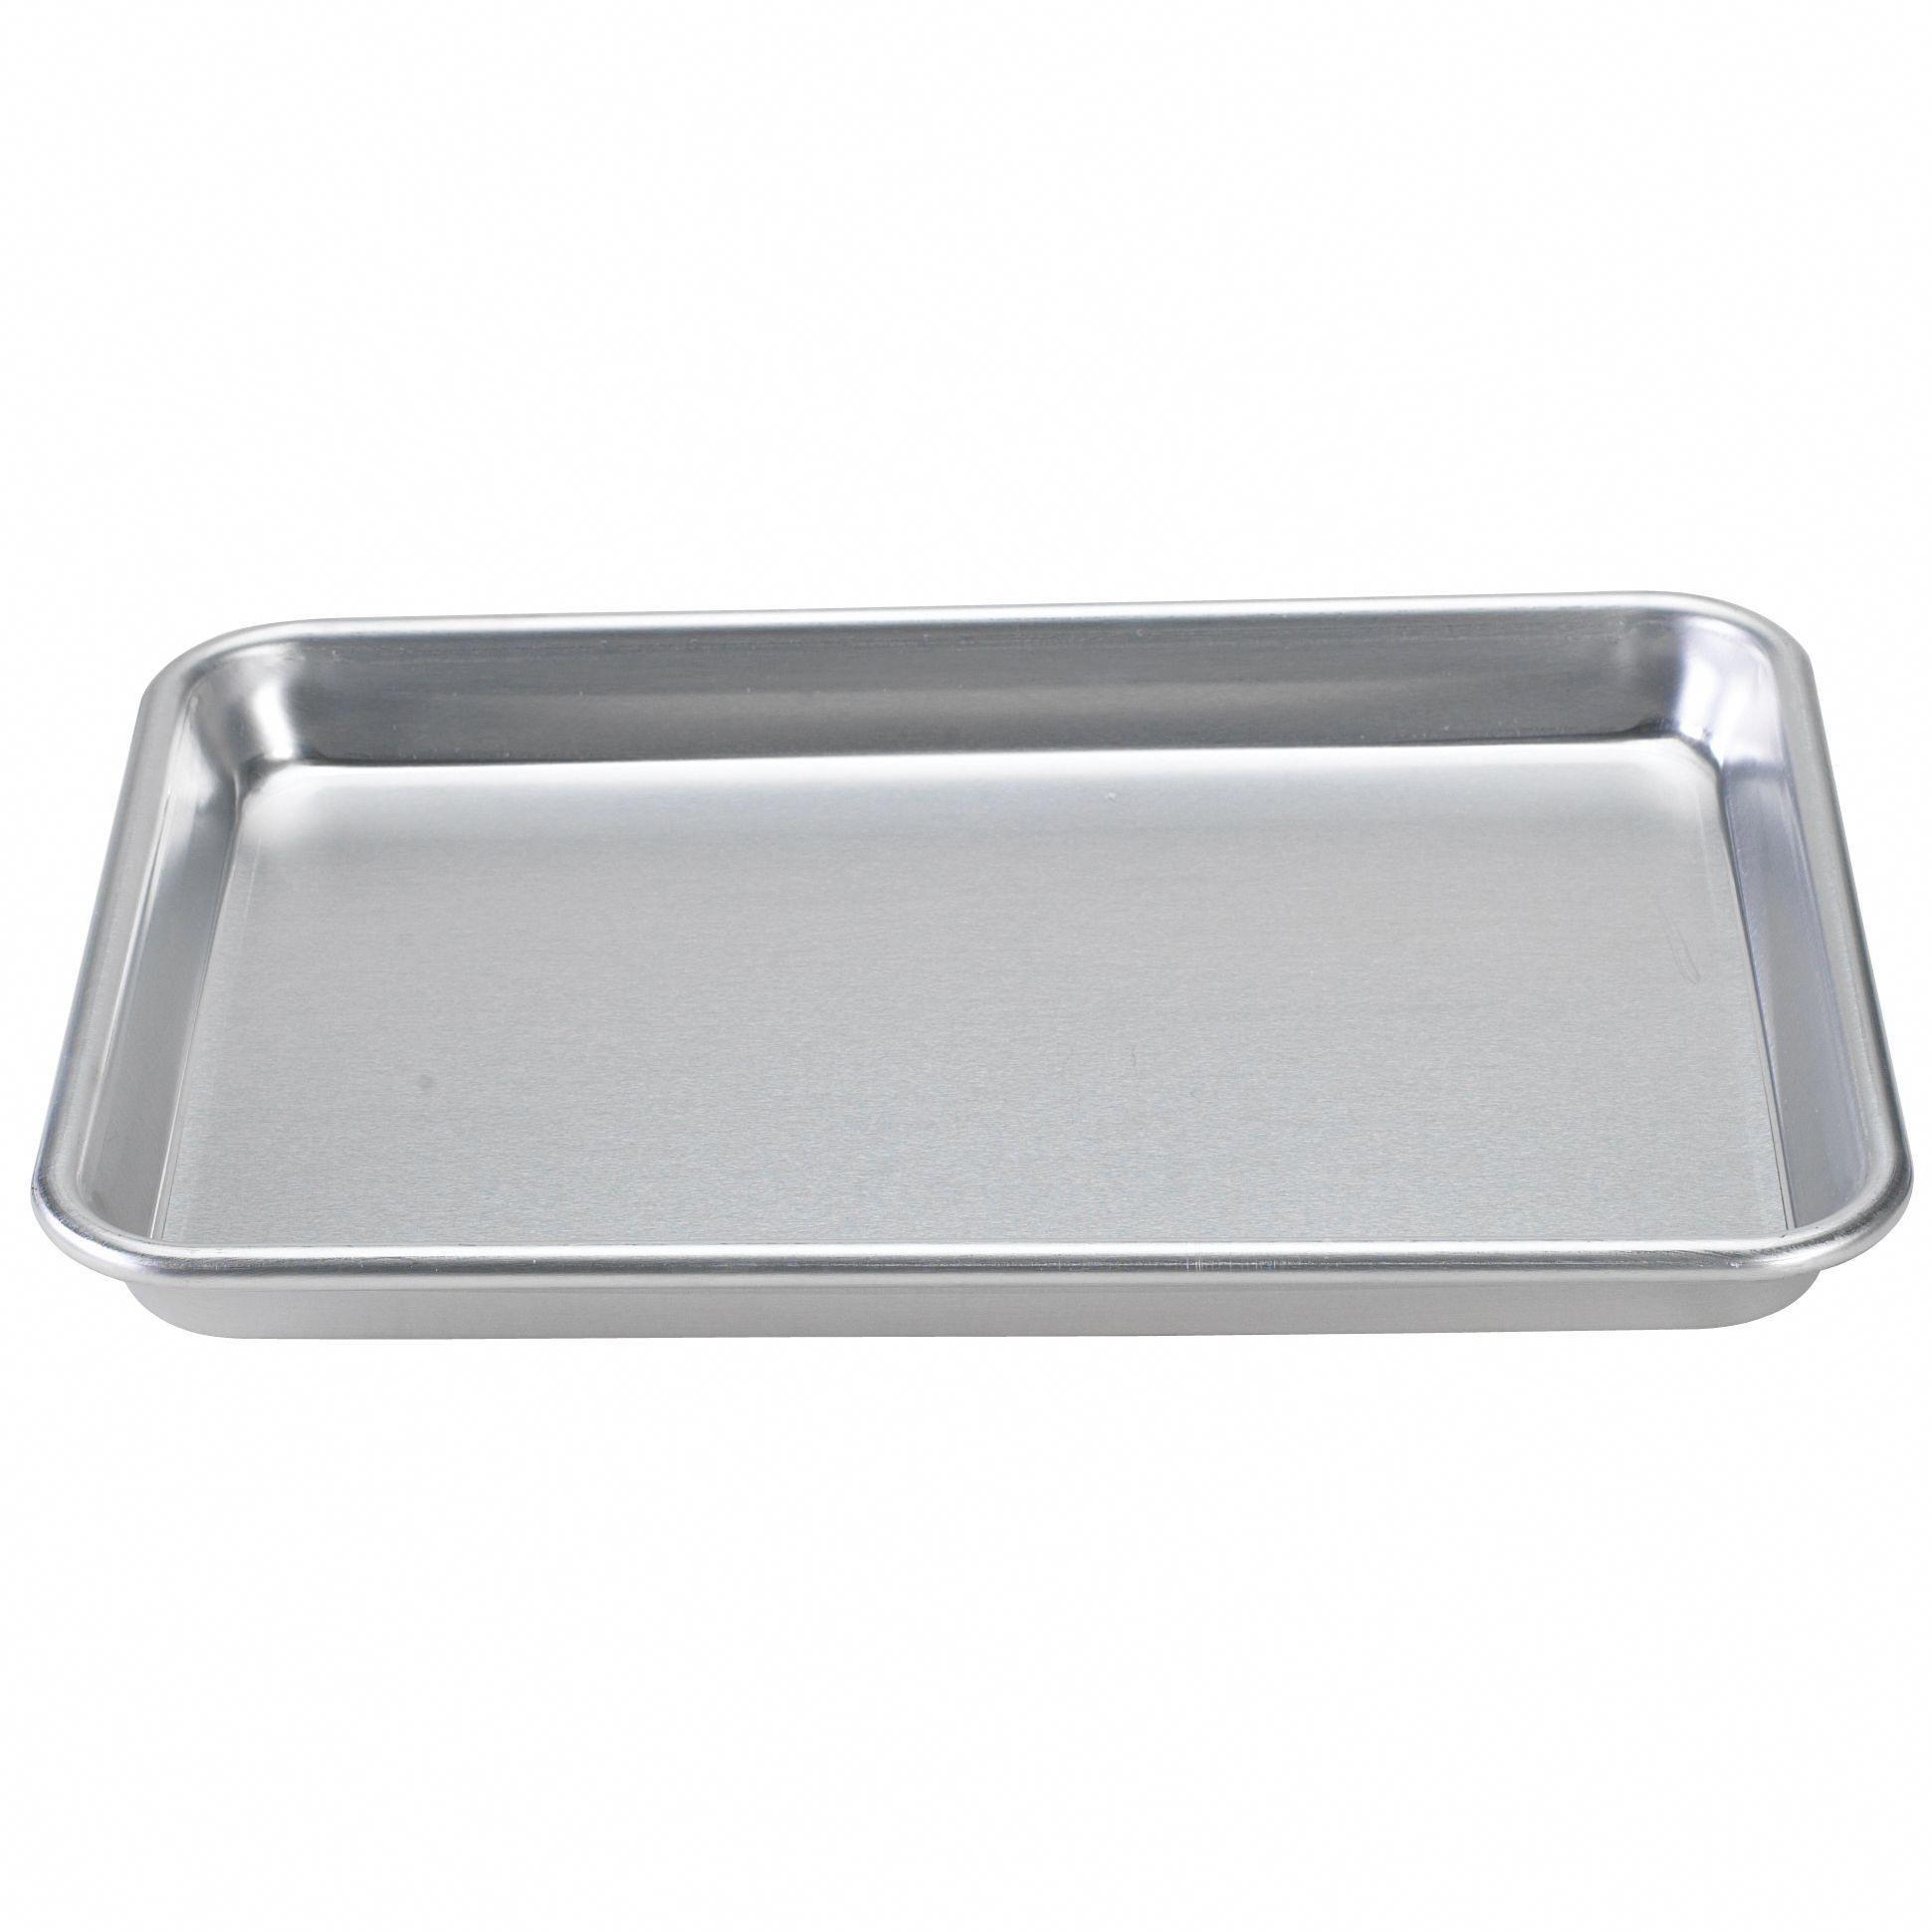 Nordic Ware 45300 13 X 9 X 1 Quarter Sheet Baking Pan Bkrs Qtr Sheet 13x9 Silver Aluminum Size 9 X 13 Metal Nordic Ware Baking Pans Aluminum Bakeware